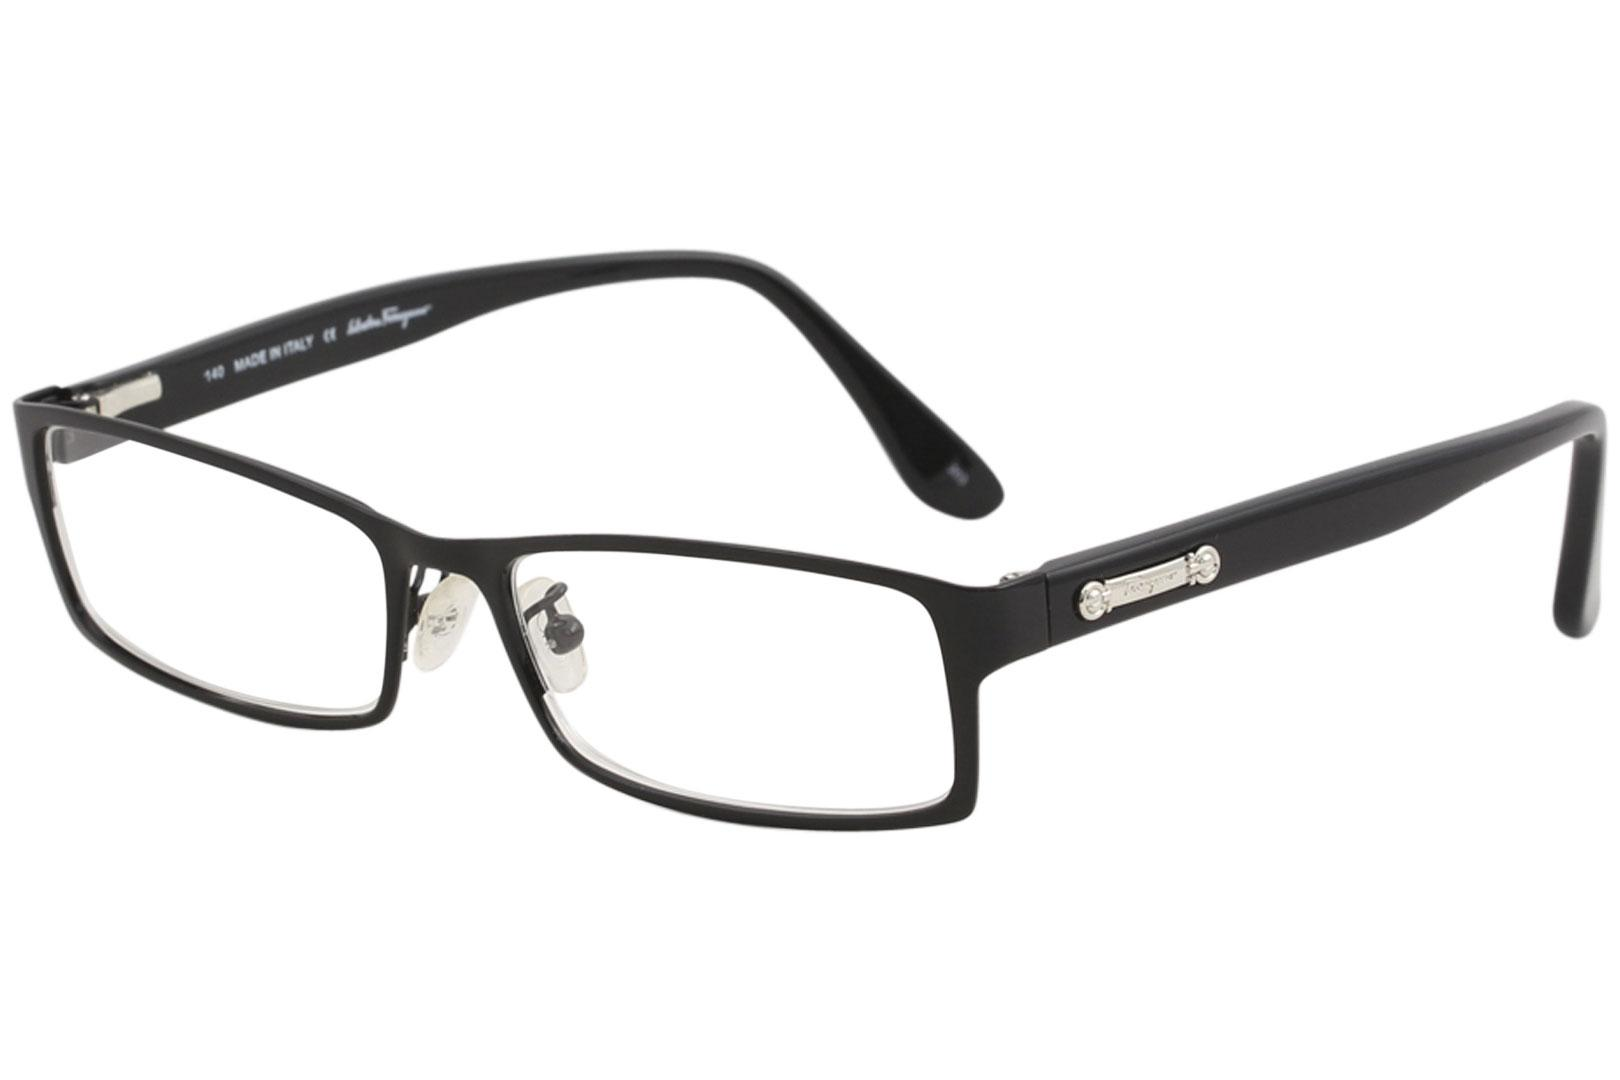 23b1d8d9640 Salvatore Ferragamo Men s Eyeglasses SF2103A SF 2103 A Full Rim Optical  Frame